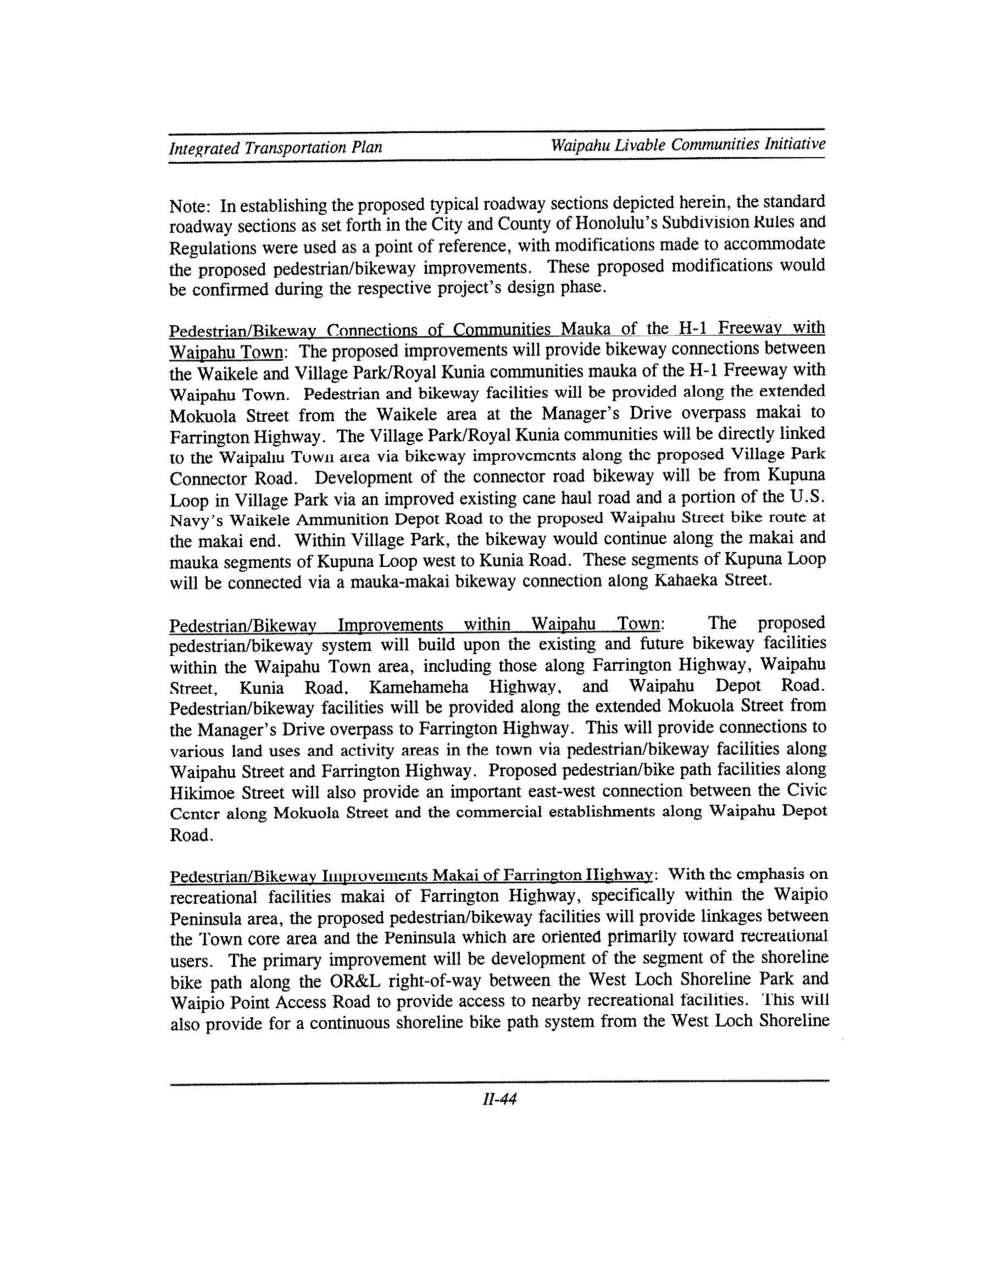 160531_WaipahuLivableCommunities(1998)_Page_059.jpg